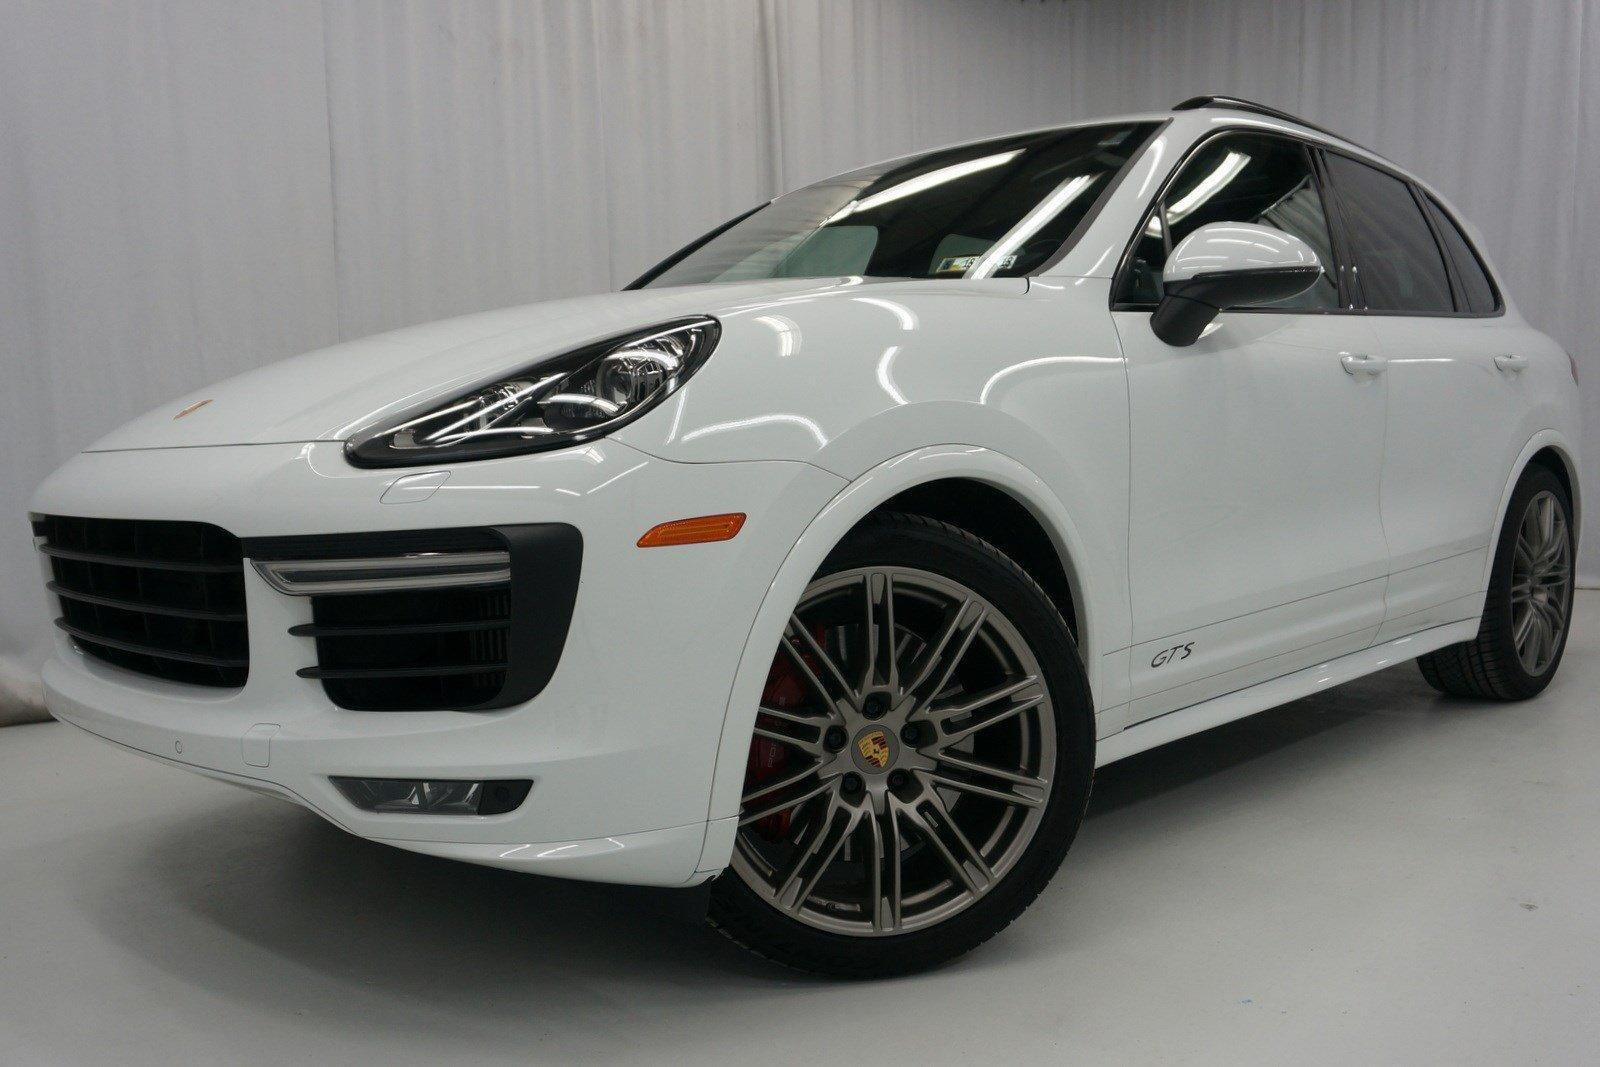 2017 Porsche Cayenne Gts Stock La80089 For Sale Near King Of Prussia Pa Pa Porsche Dealer